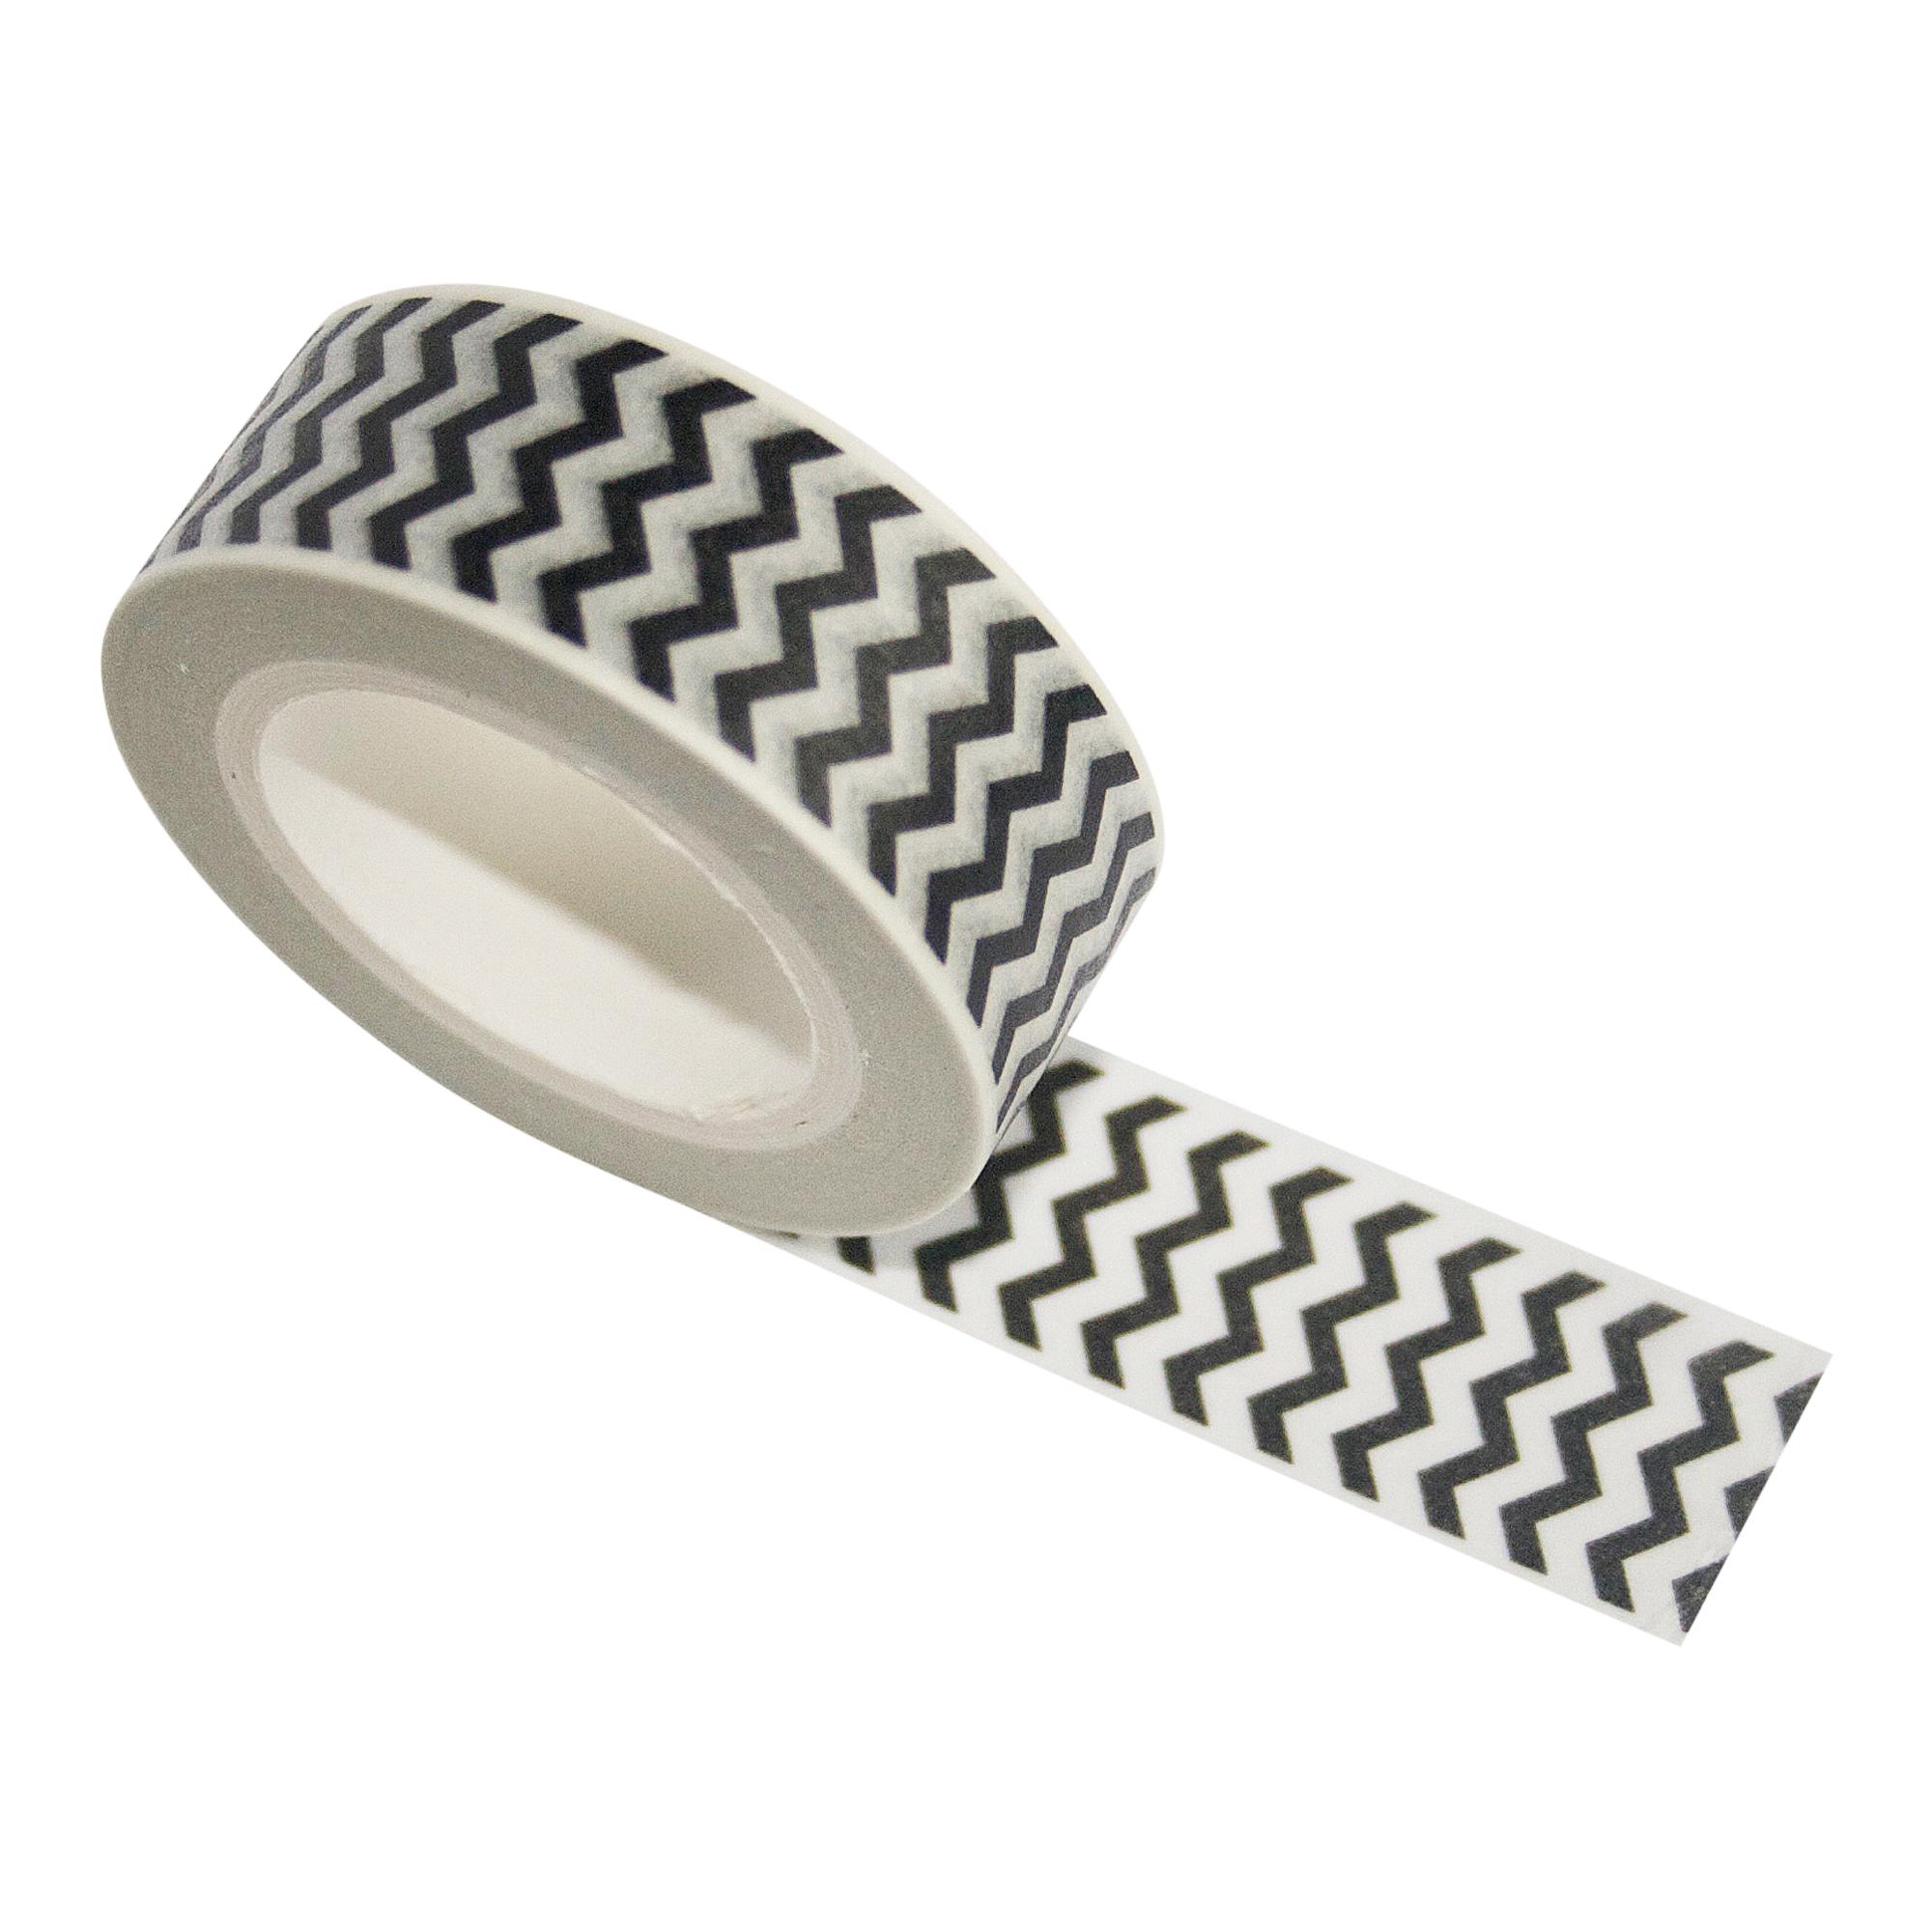 zoedt-masking-tape-wit-met-zwarte-zigzag